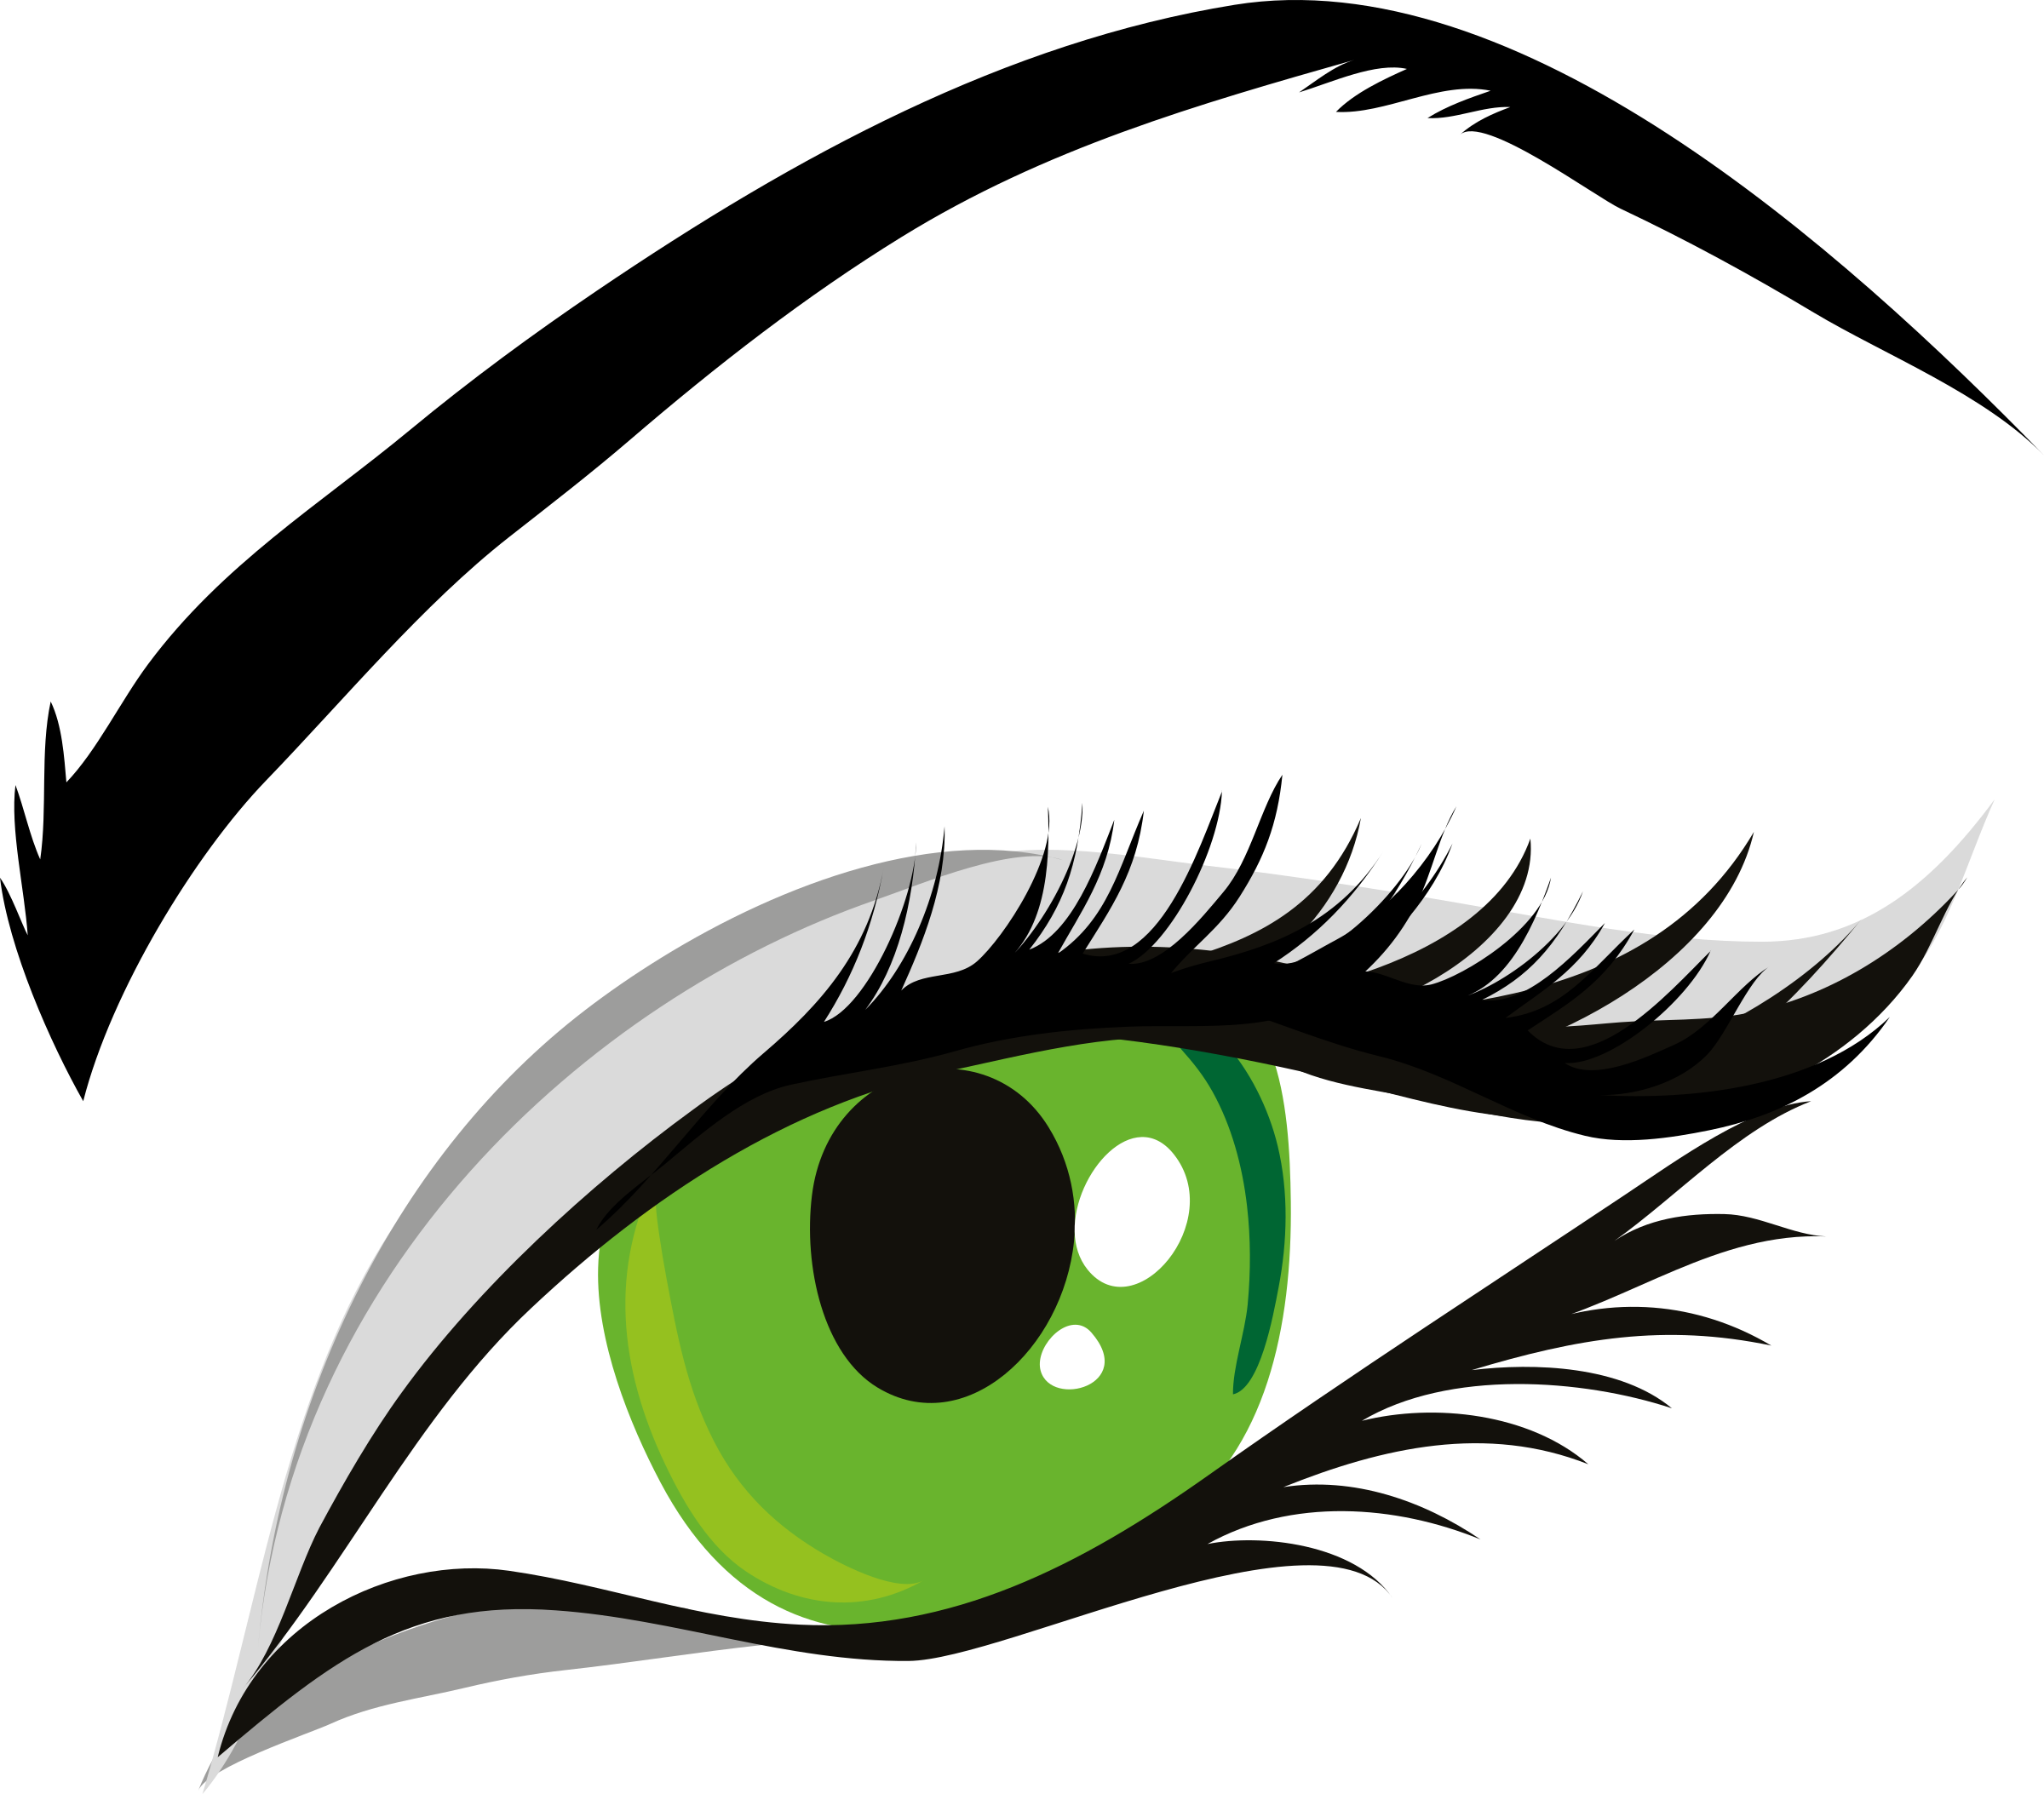 Eye big image png. Lady clipart eyes